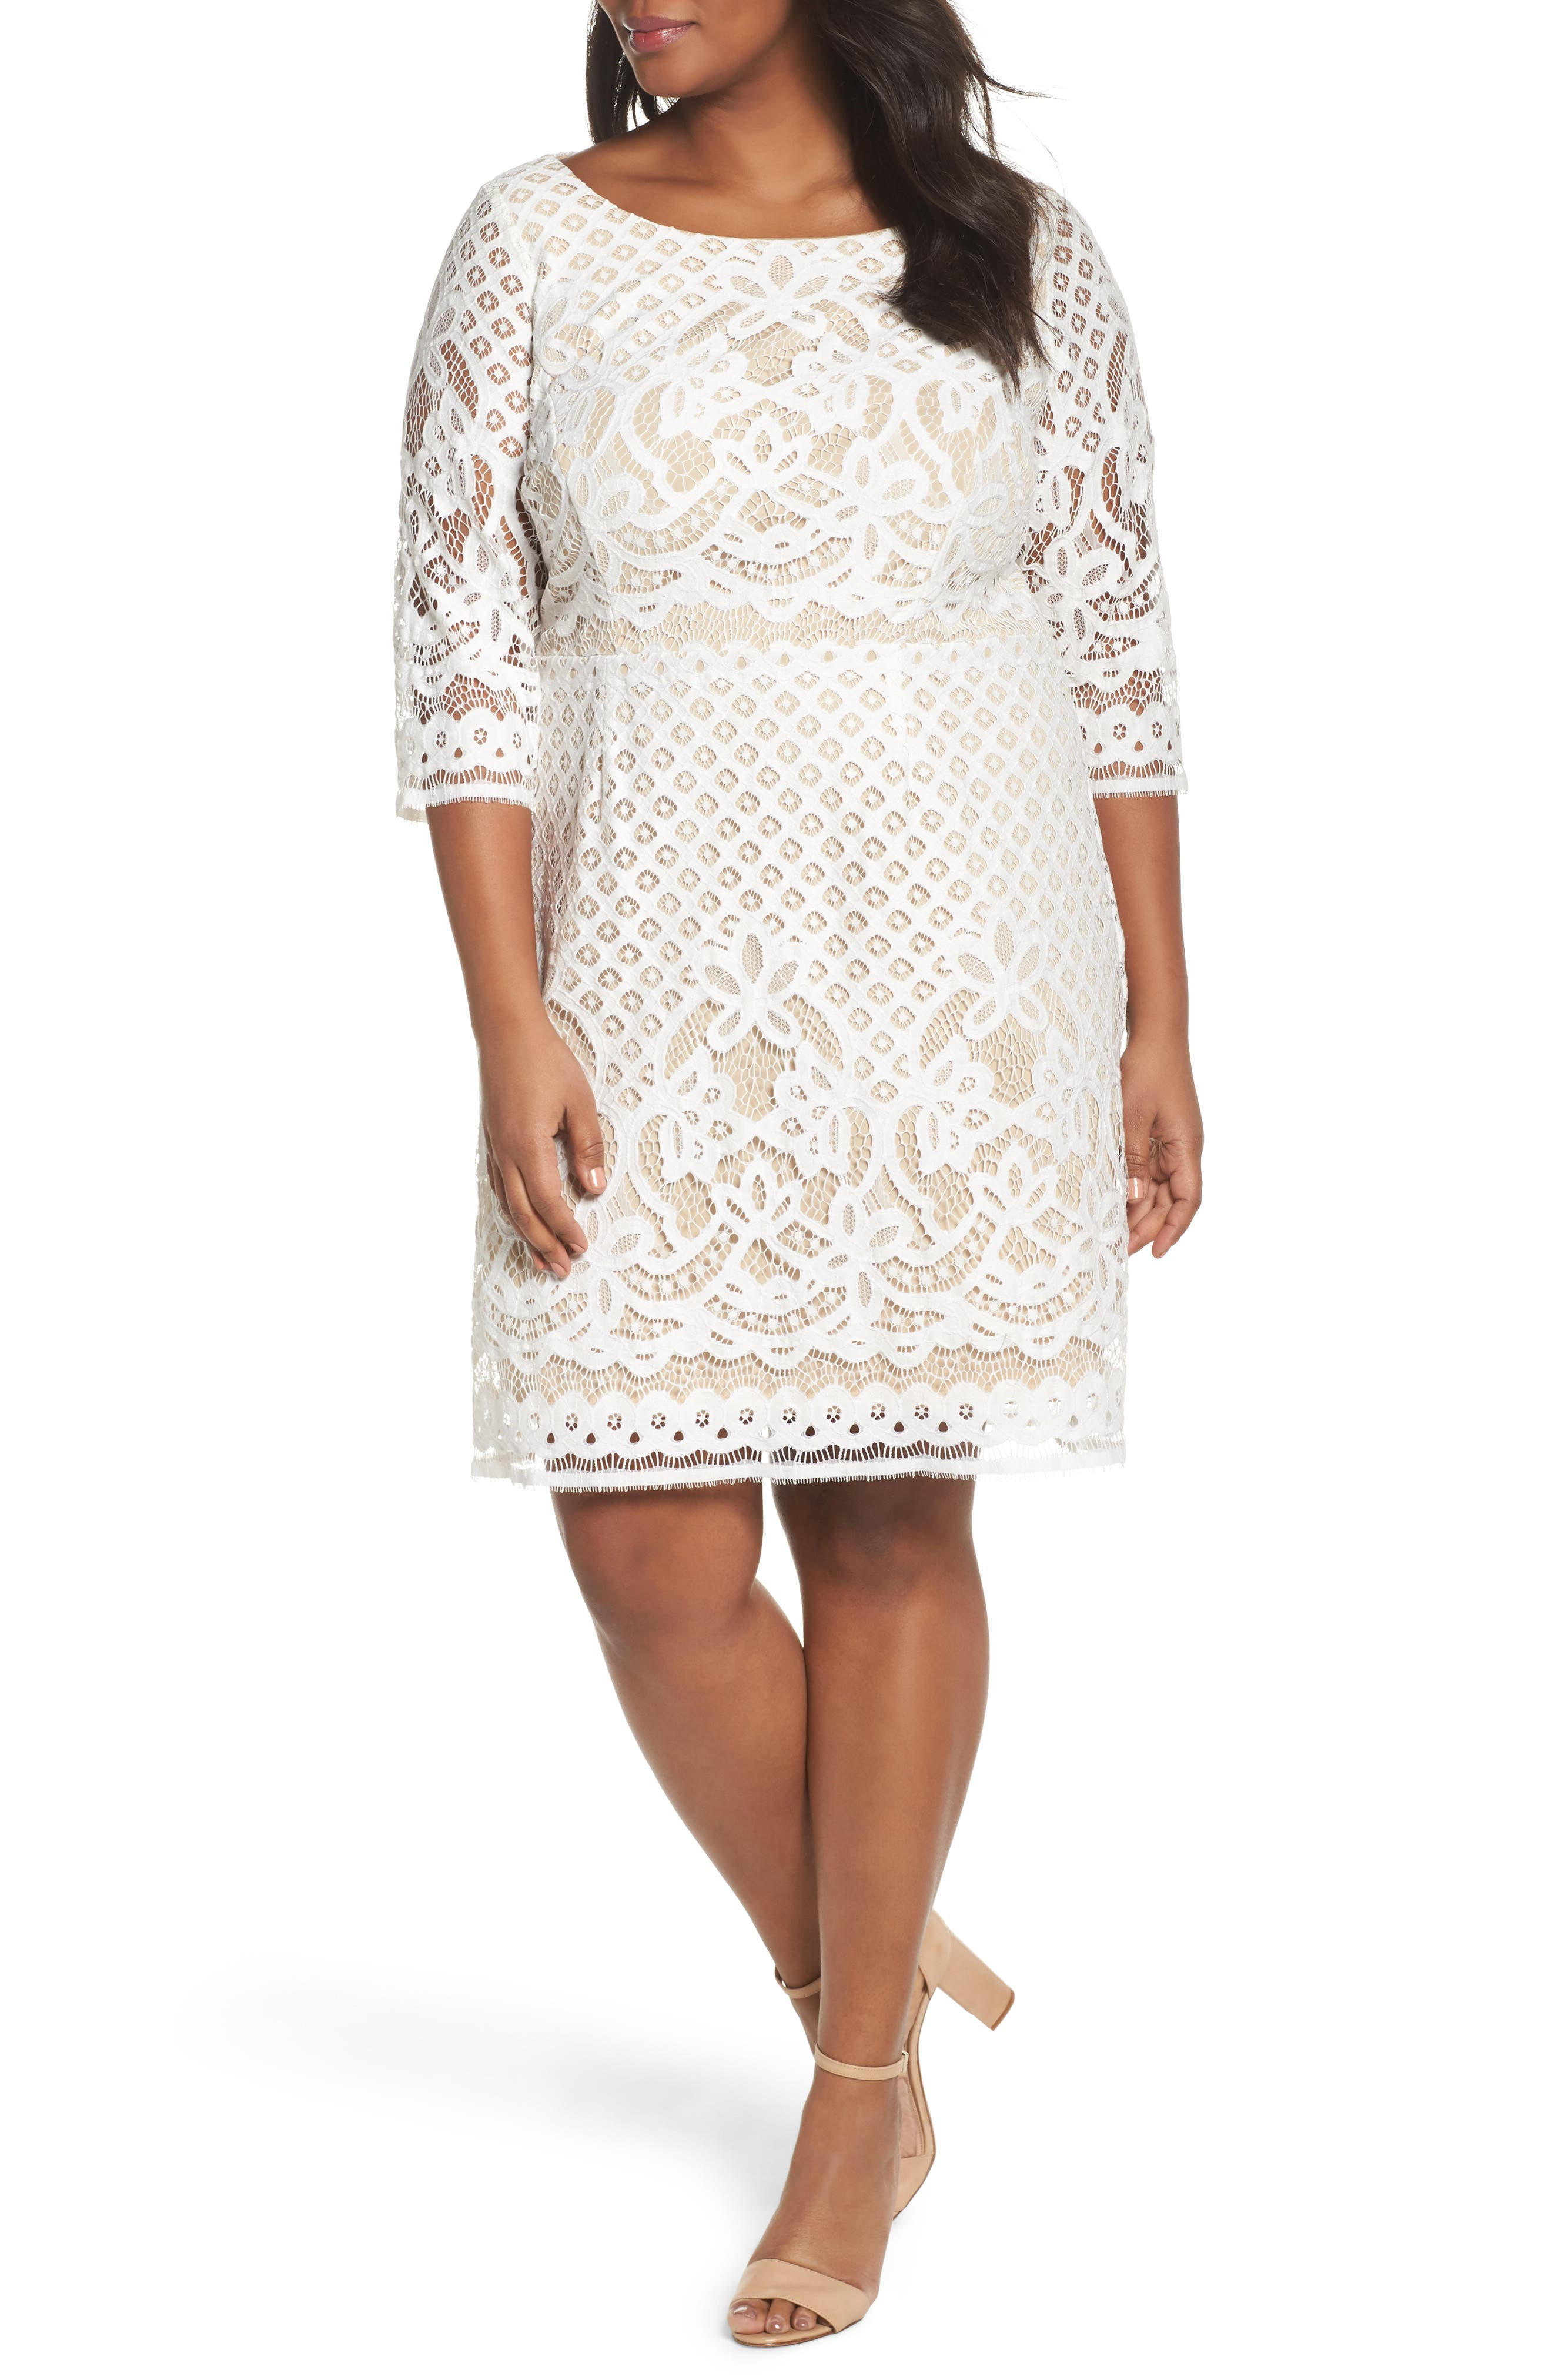 Plus size dresses white